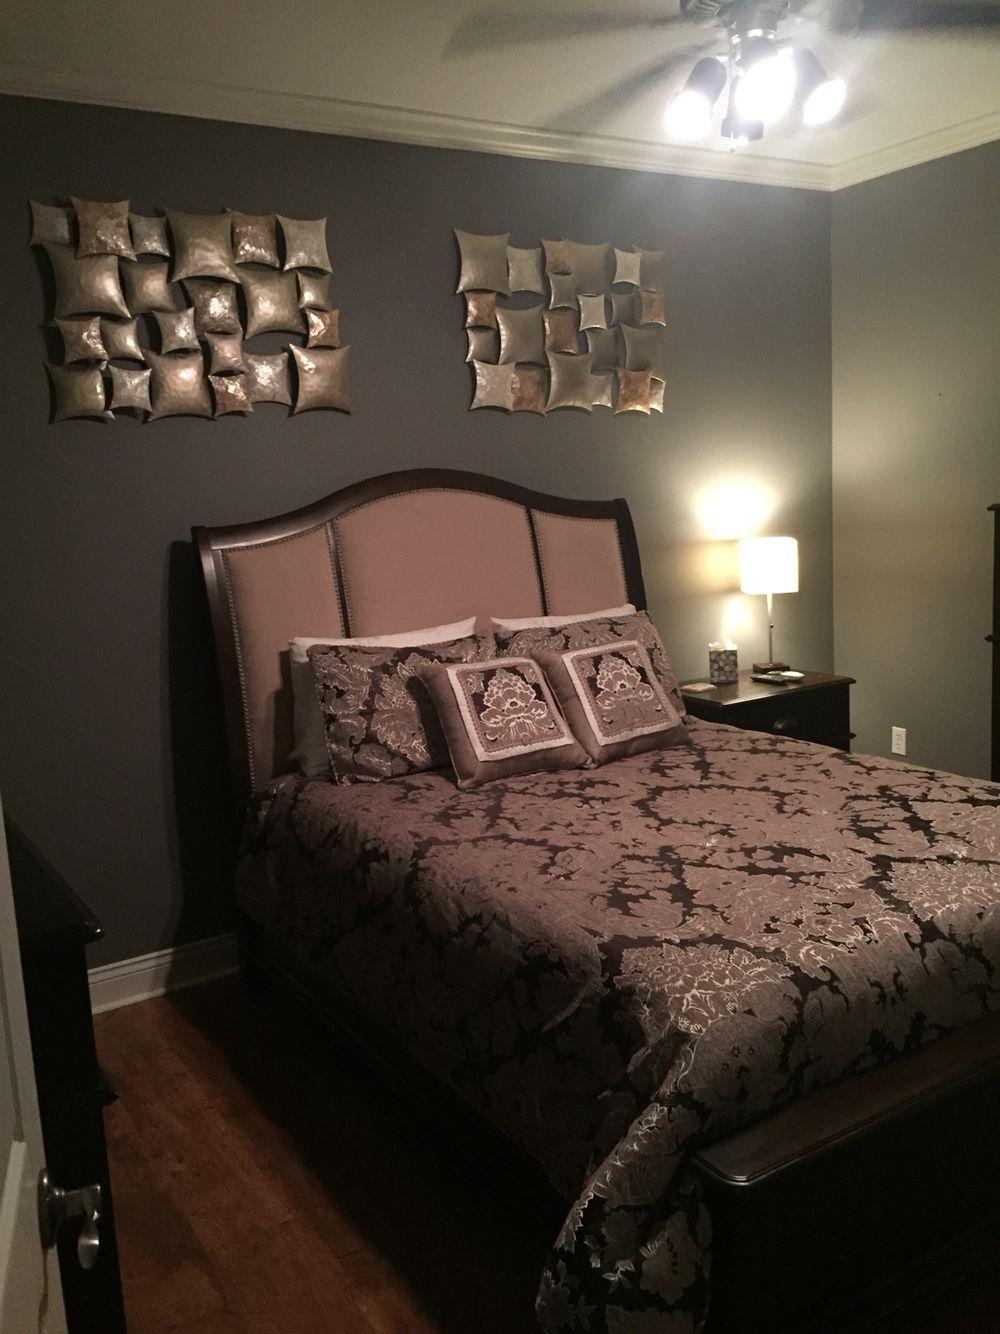 Spare bedroom | Spare bedroom, Home decor, Furniture